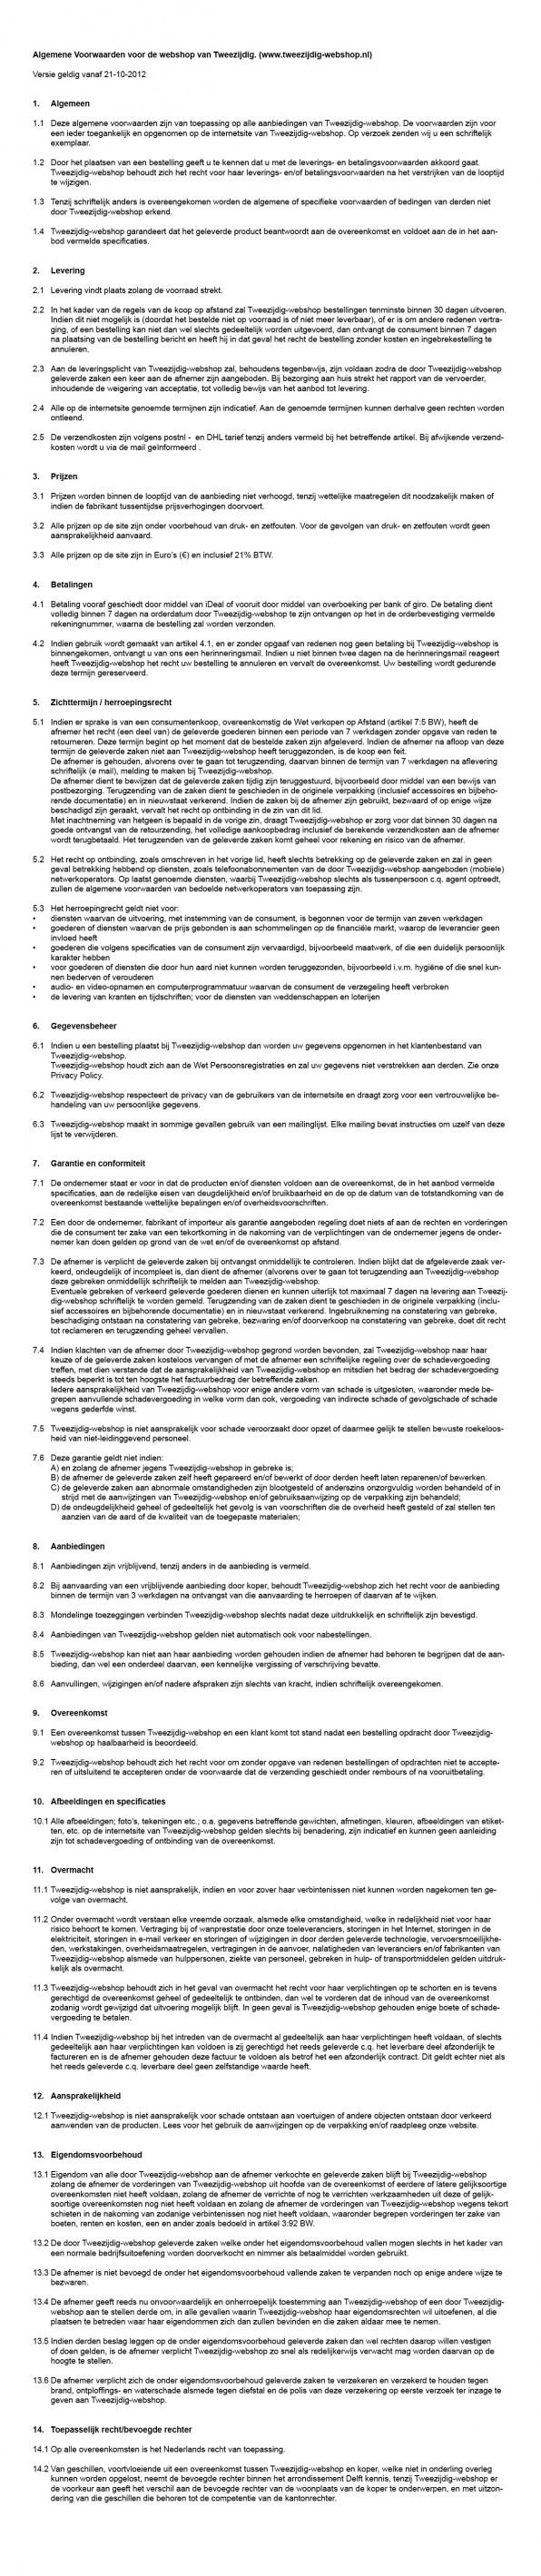 algemenevoorwaardenwebshop-tweezijdig2012.jpg